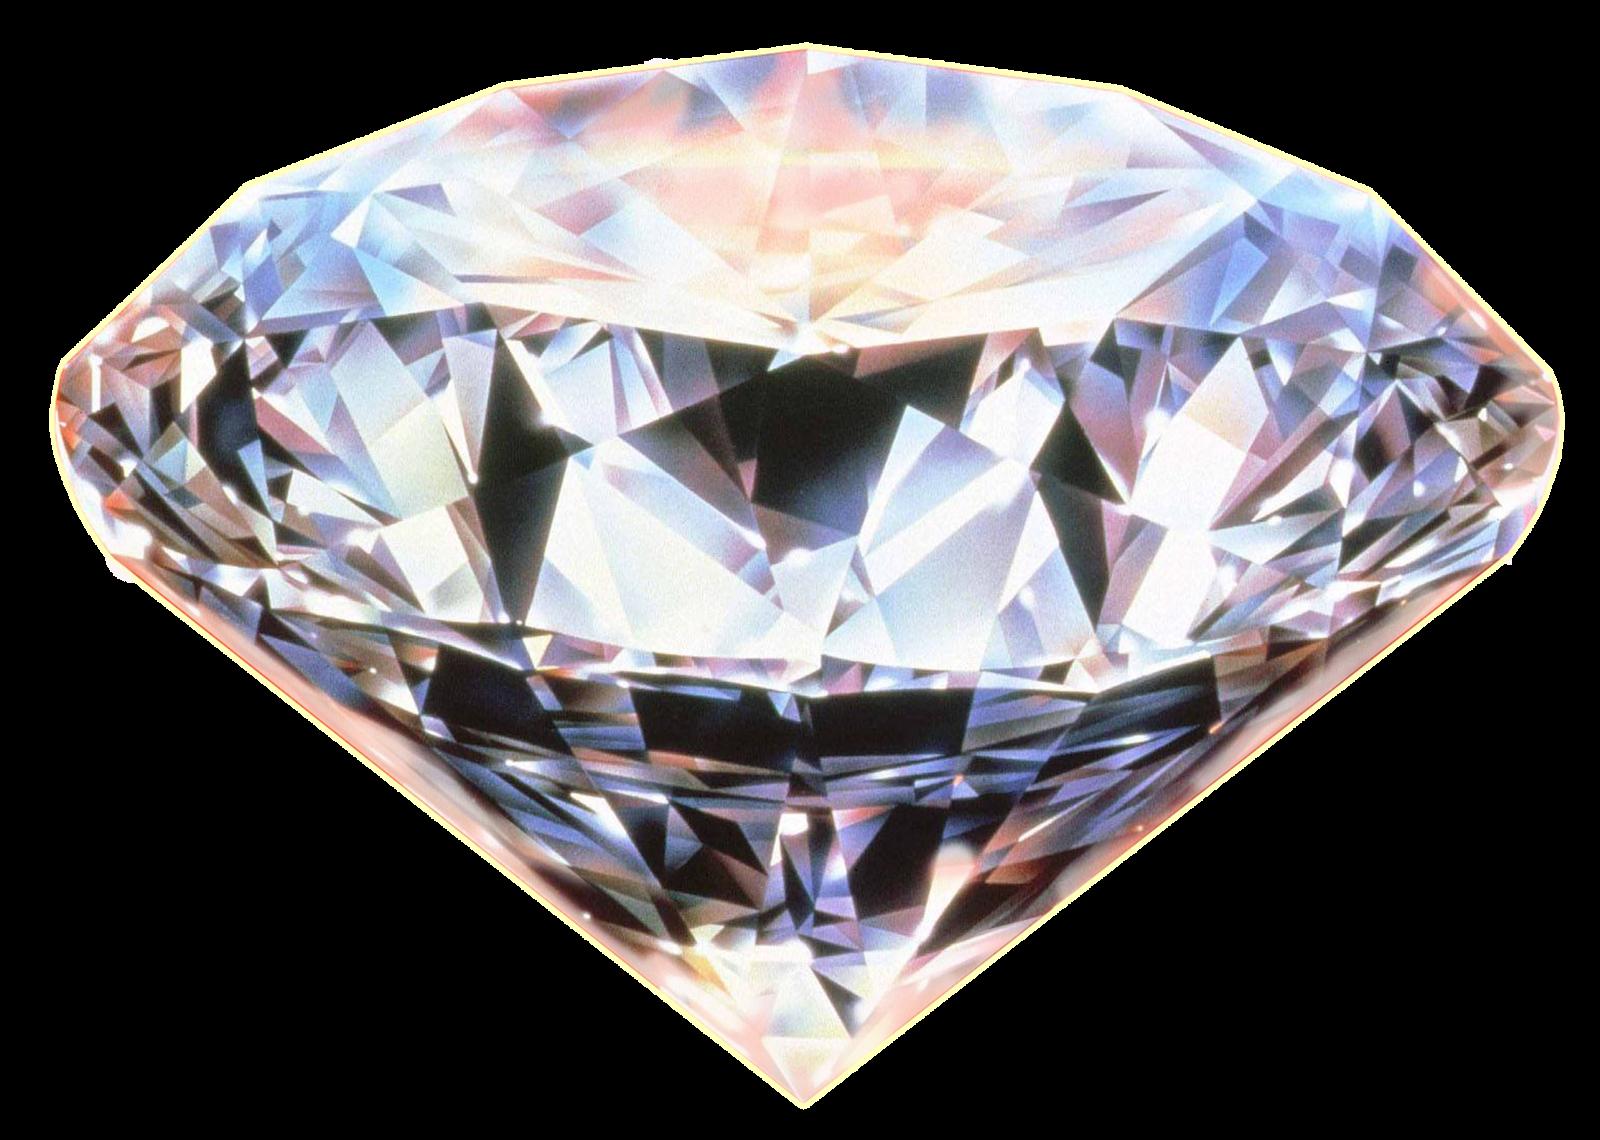 Diamonds clipart basic. Diamond transparent png pictures